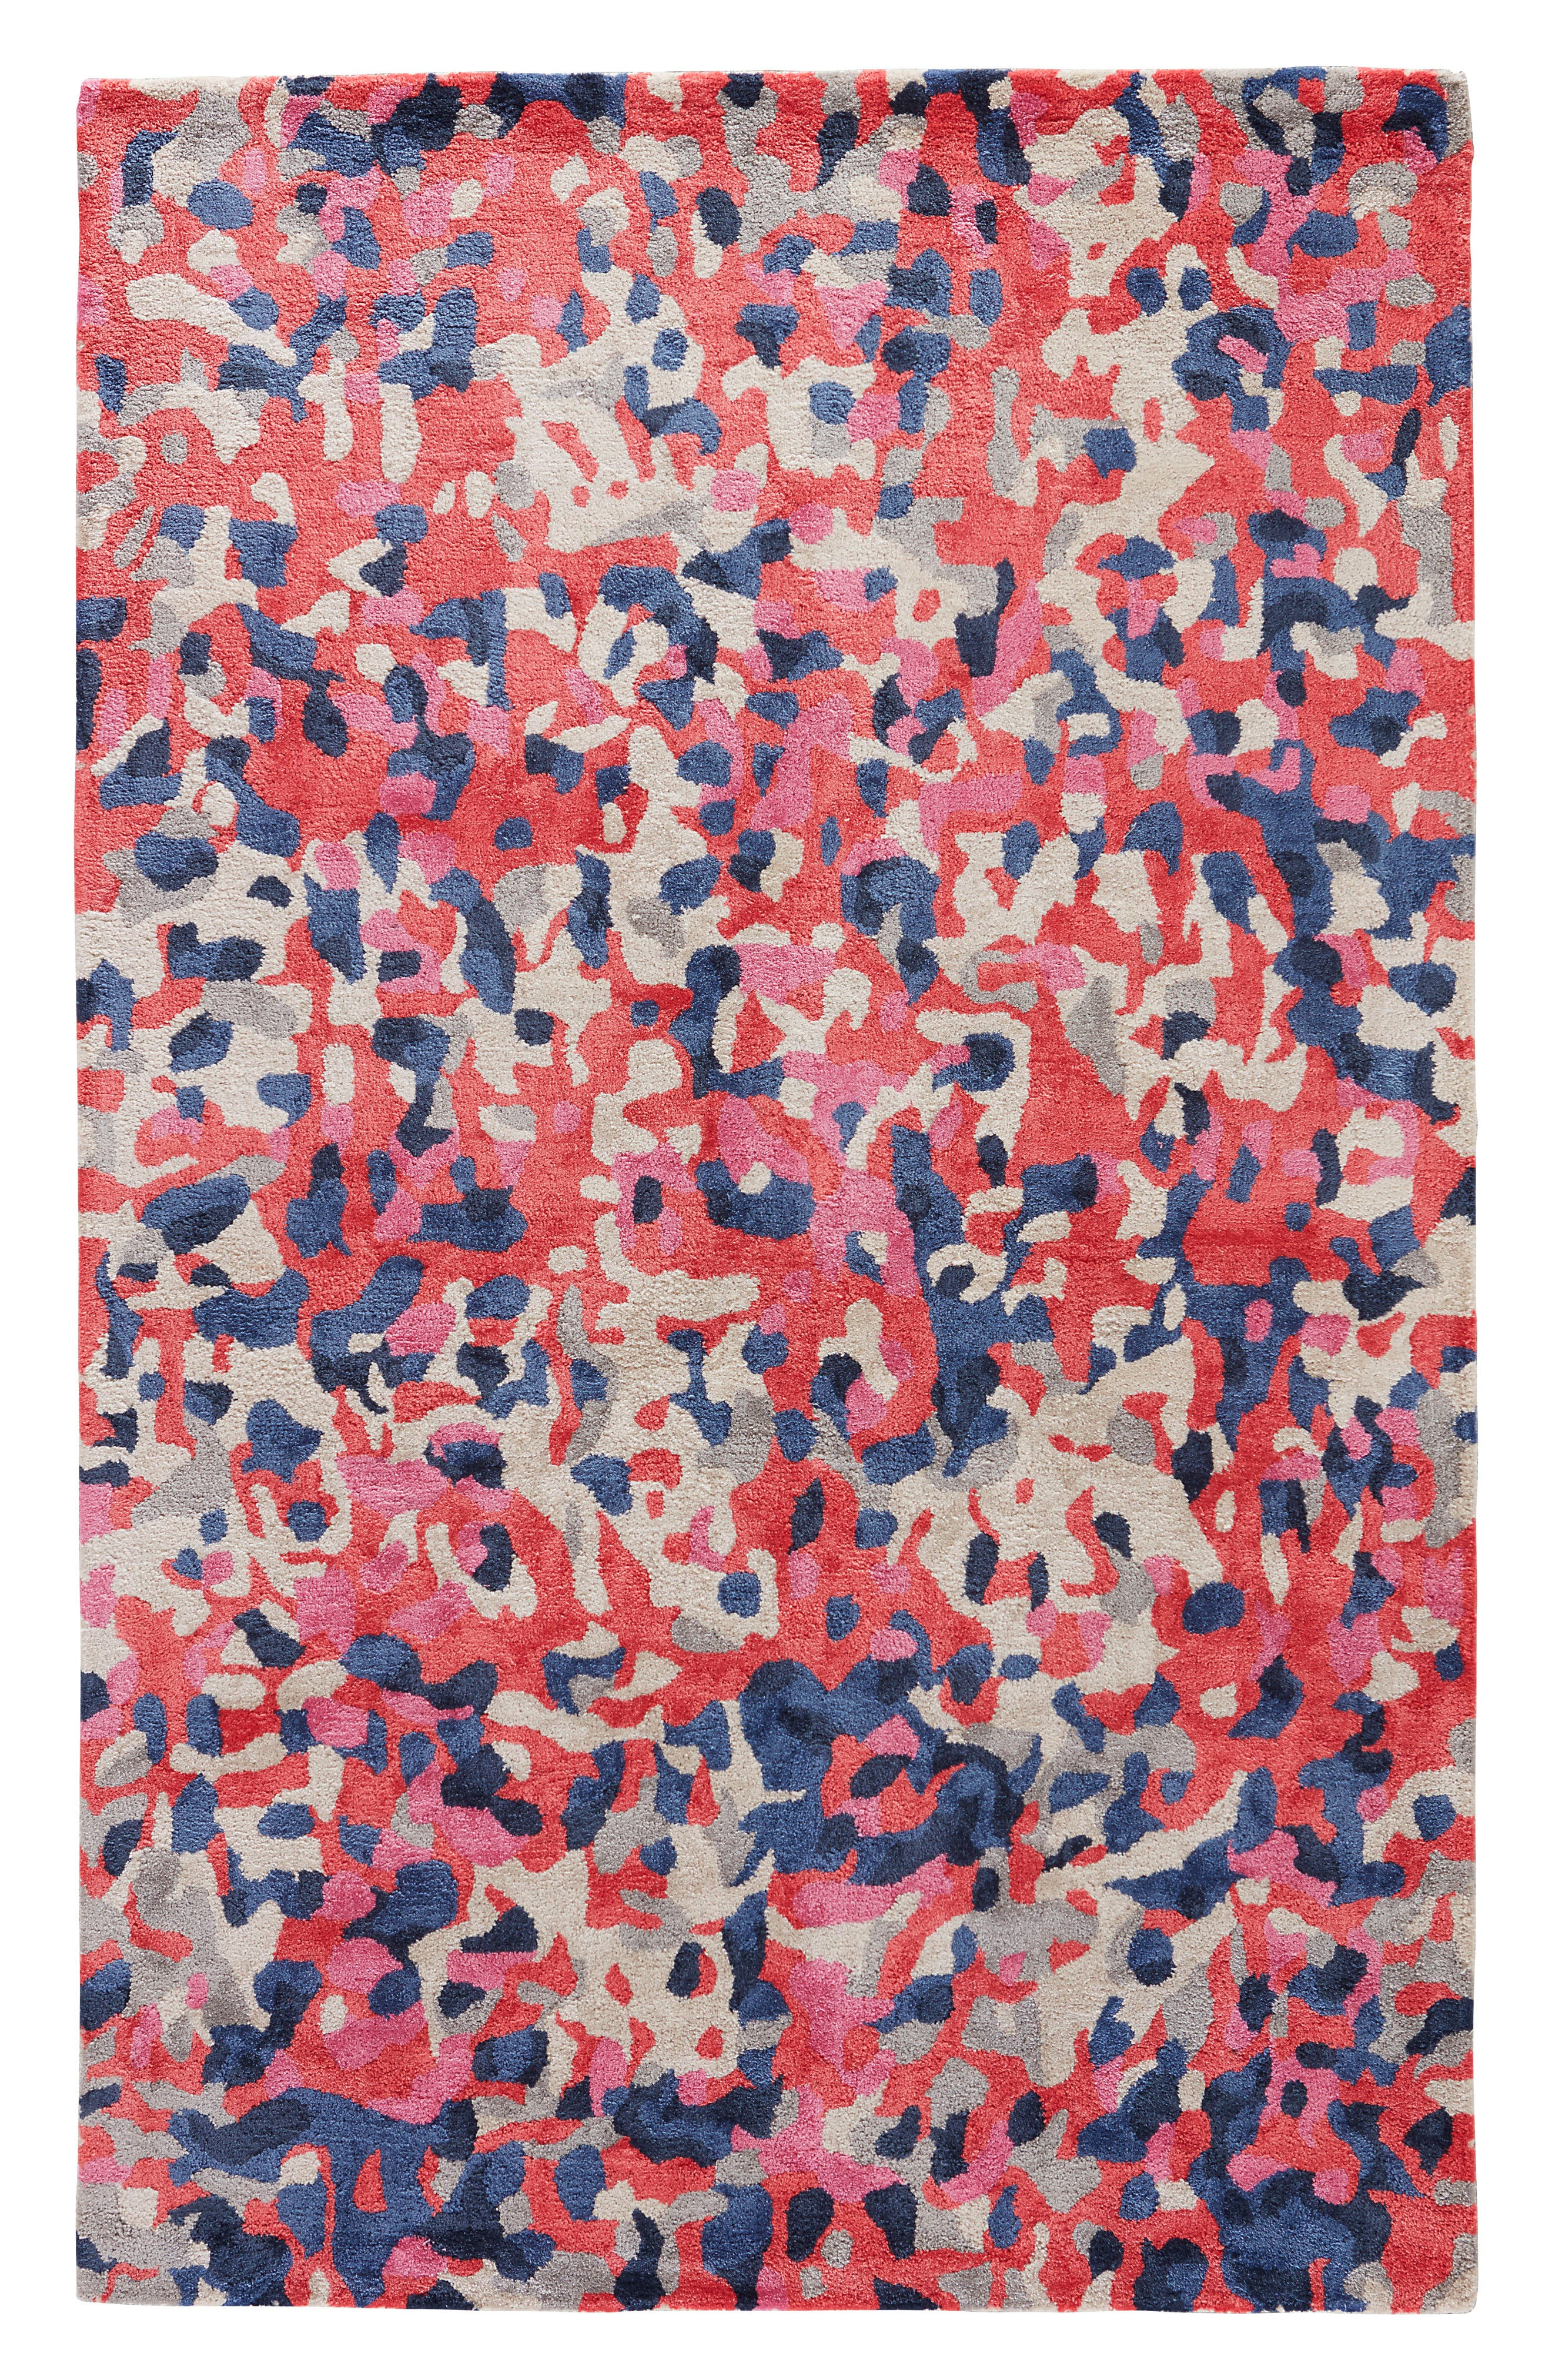 Alternate Image 1 Selected - kate spade new york splatter paint rug